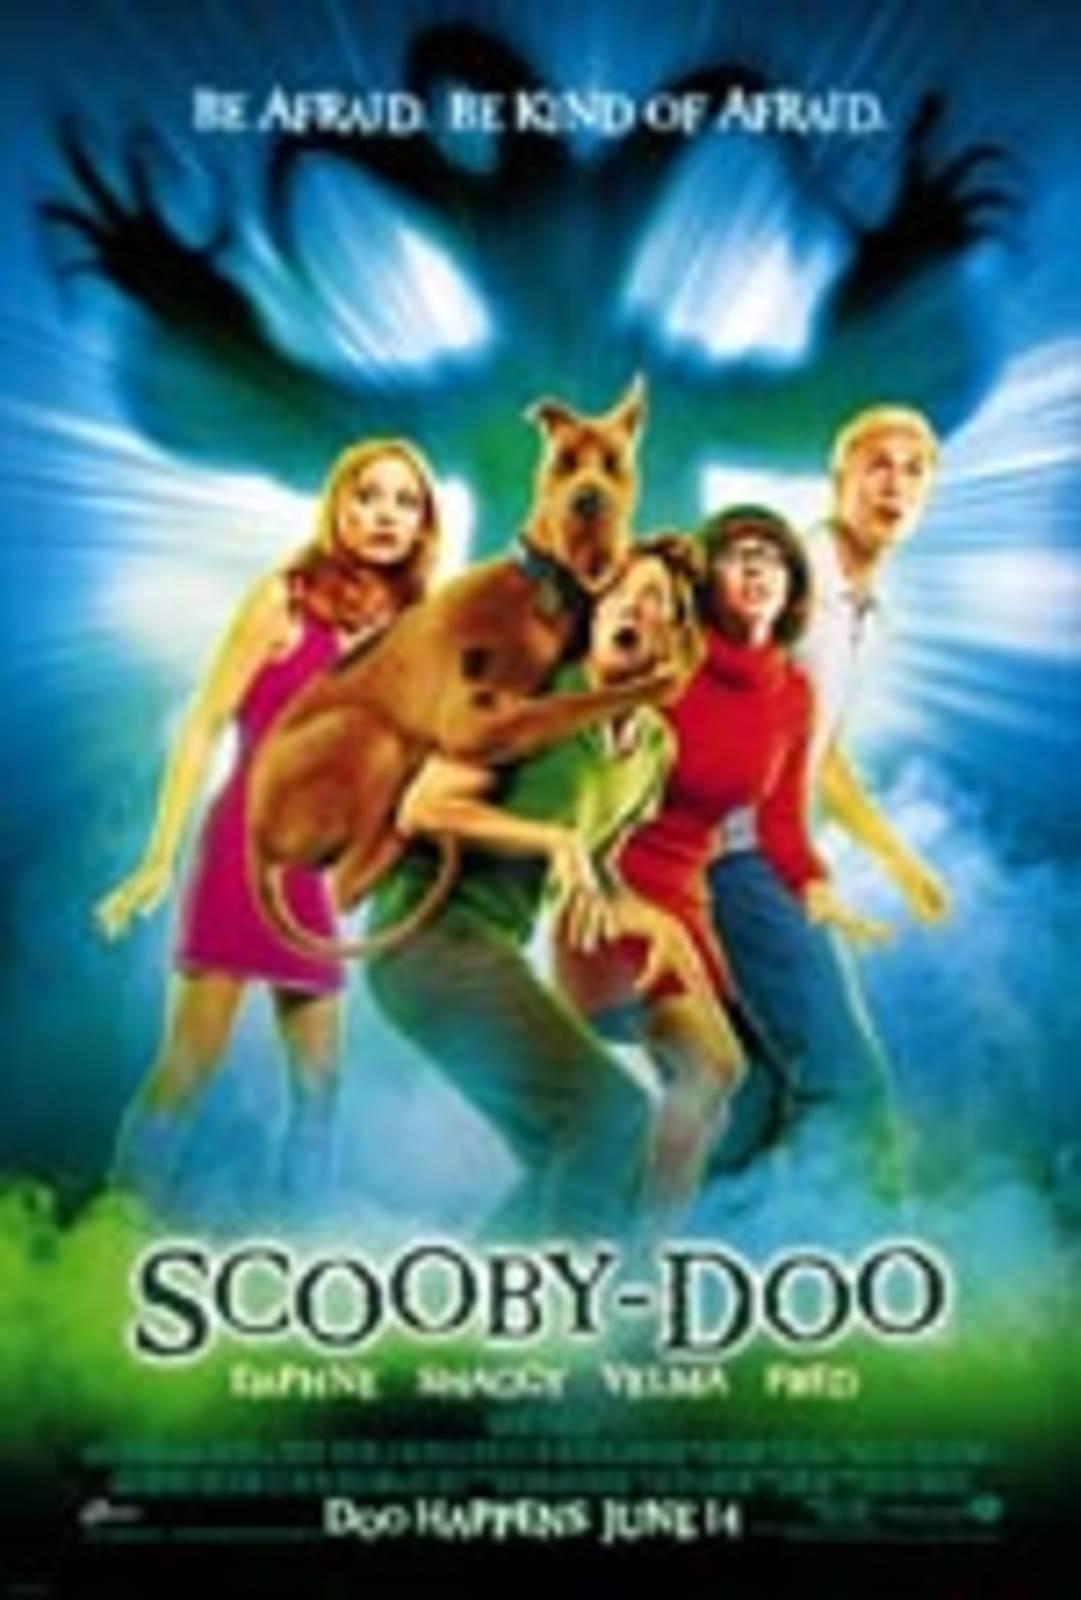 scooby doo adaptation cinmatographique du clbre dessin anim - Dessin Anim Scooby Doo